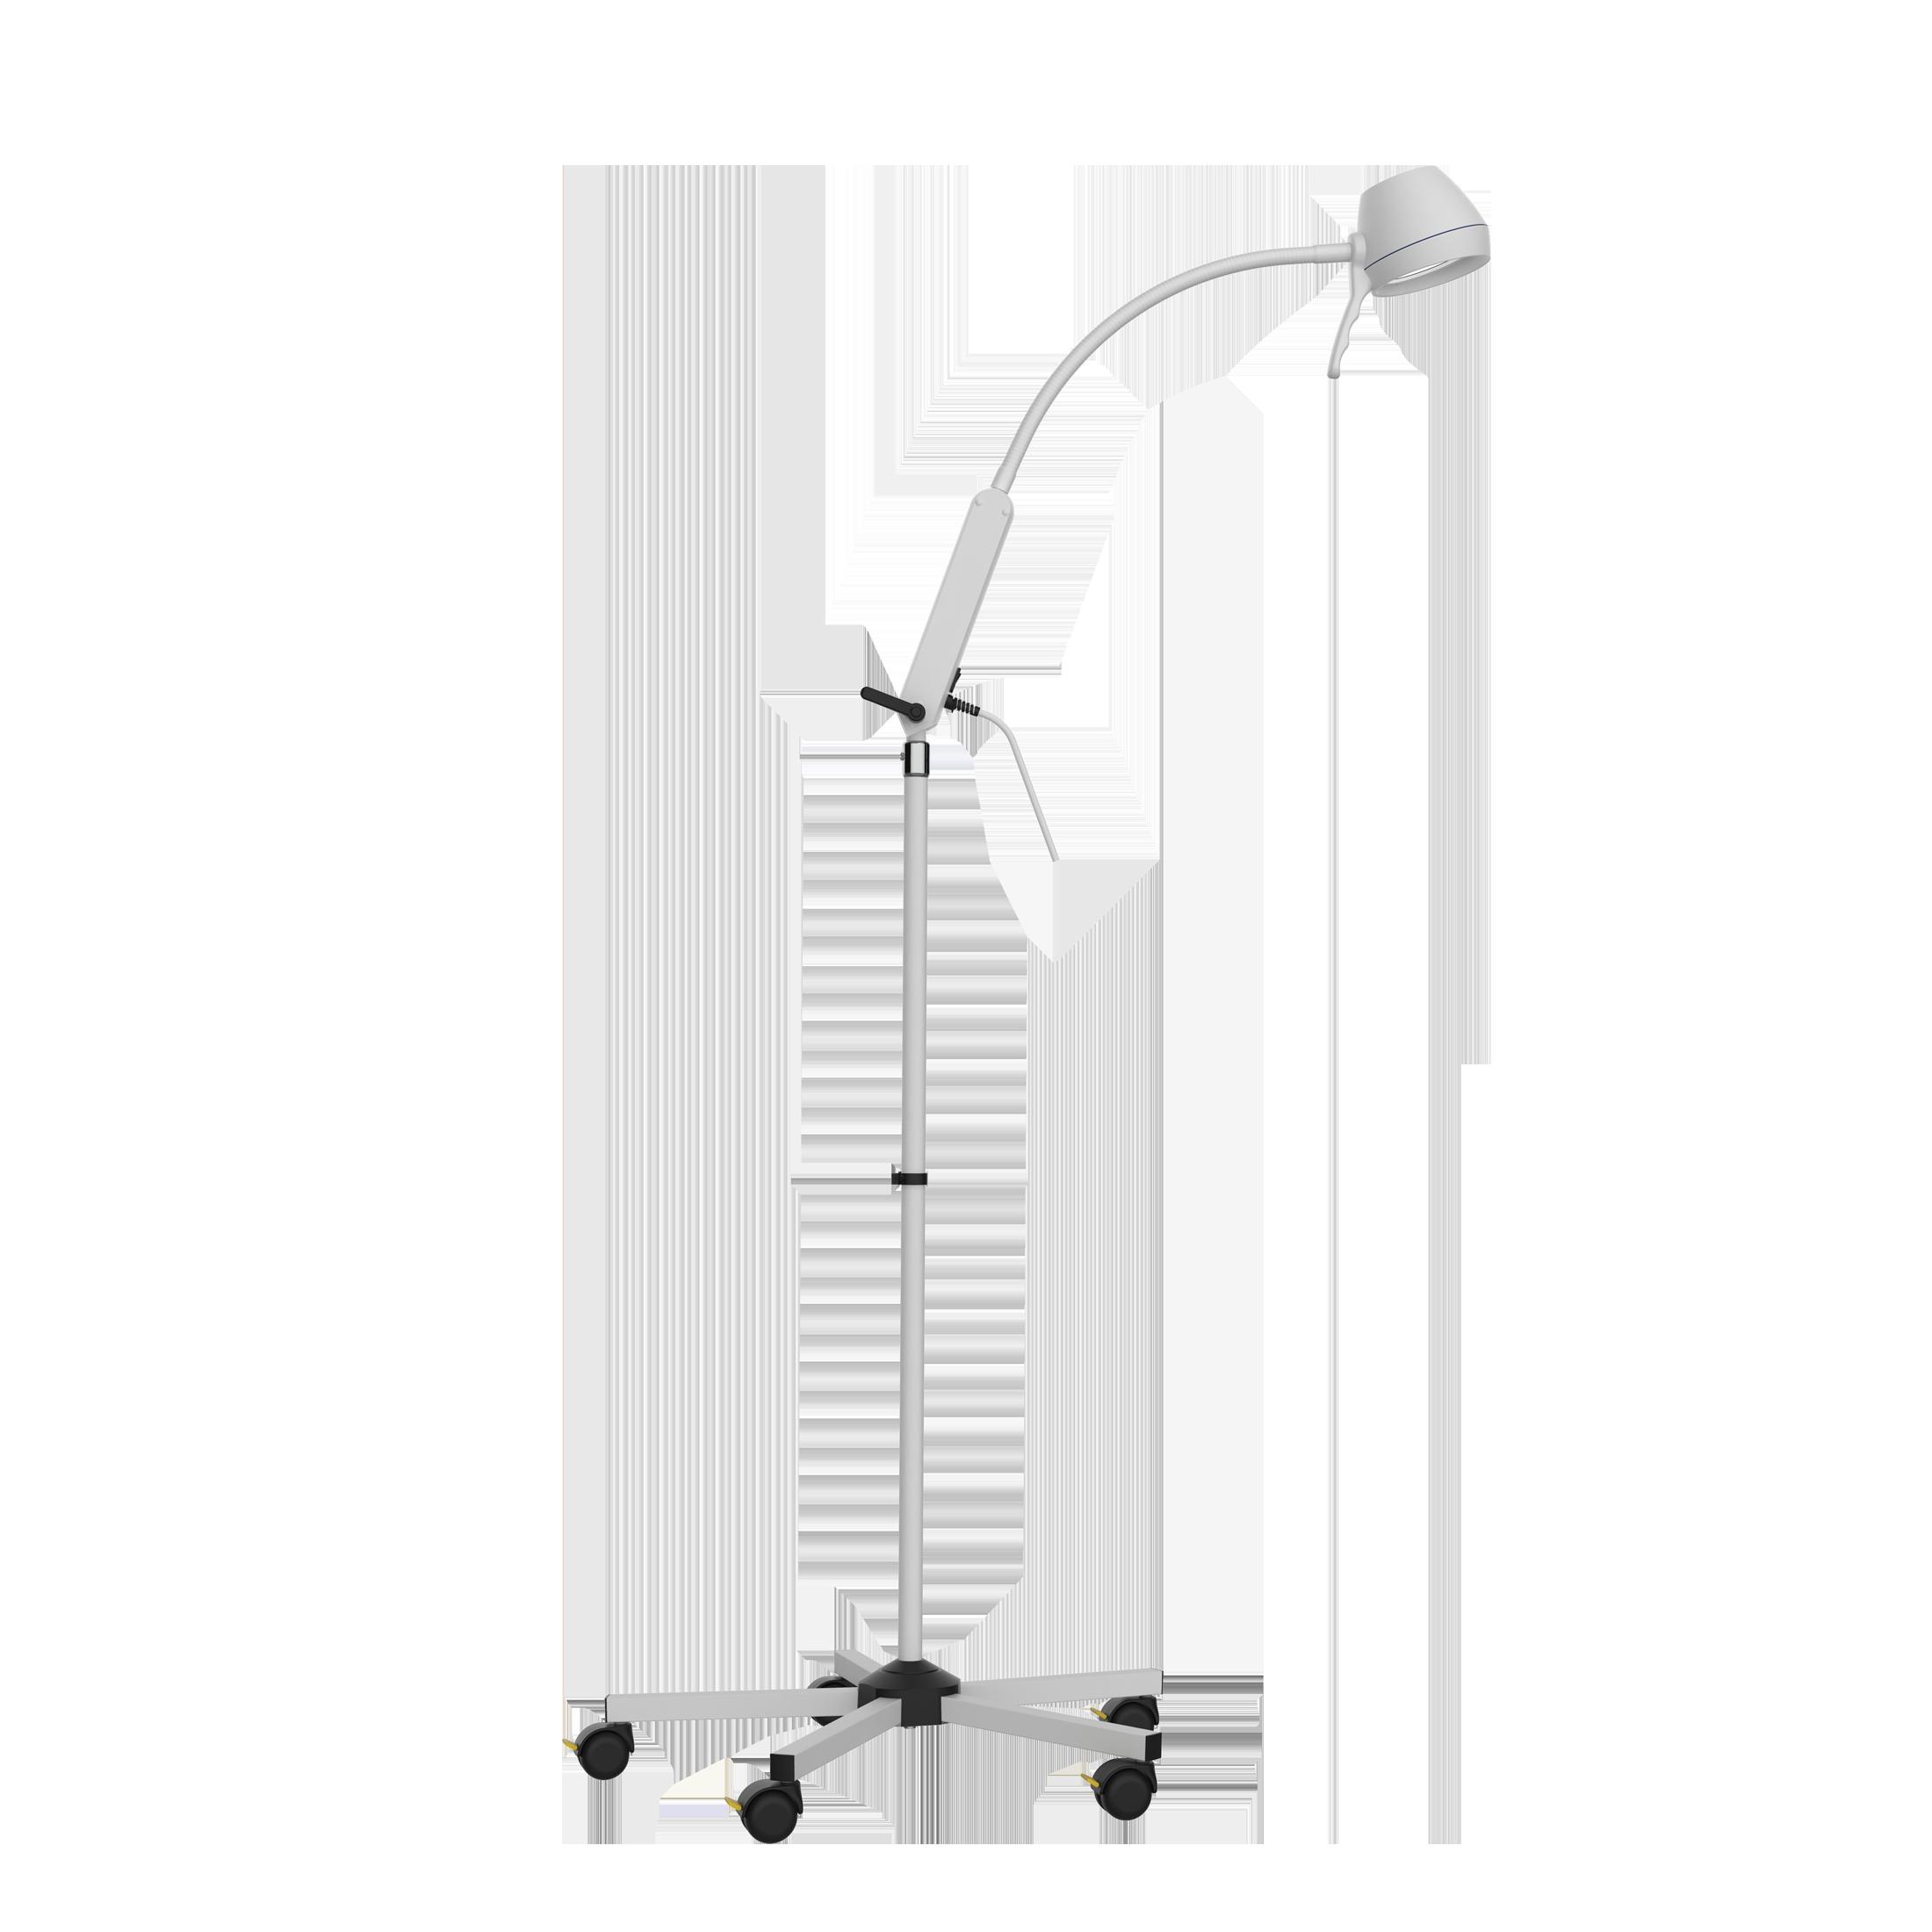 Mobile LED-Untersuchungsleuchte